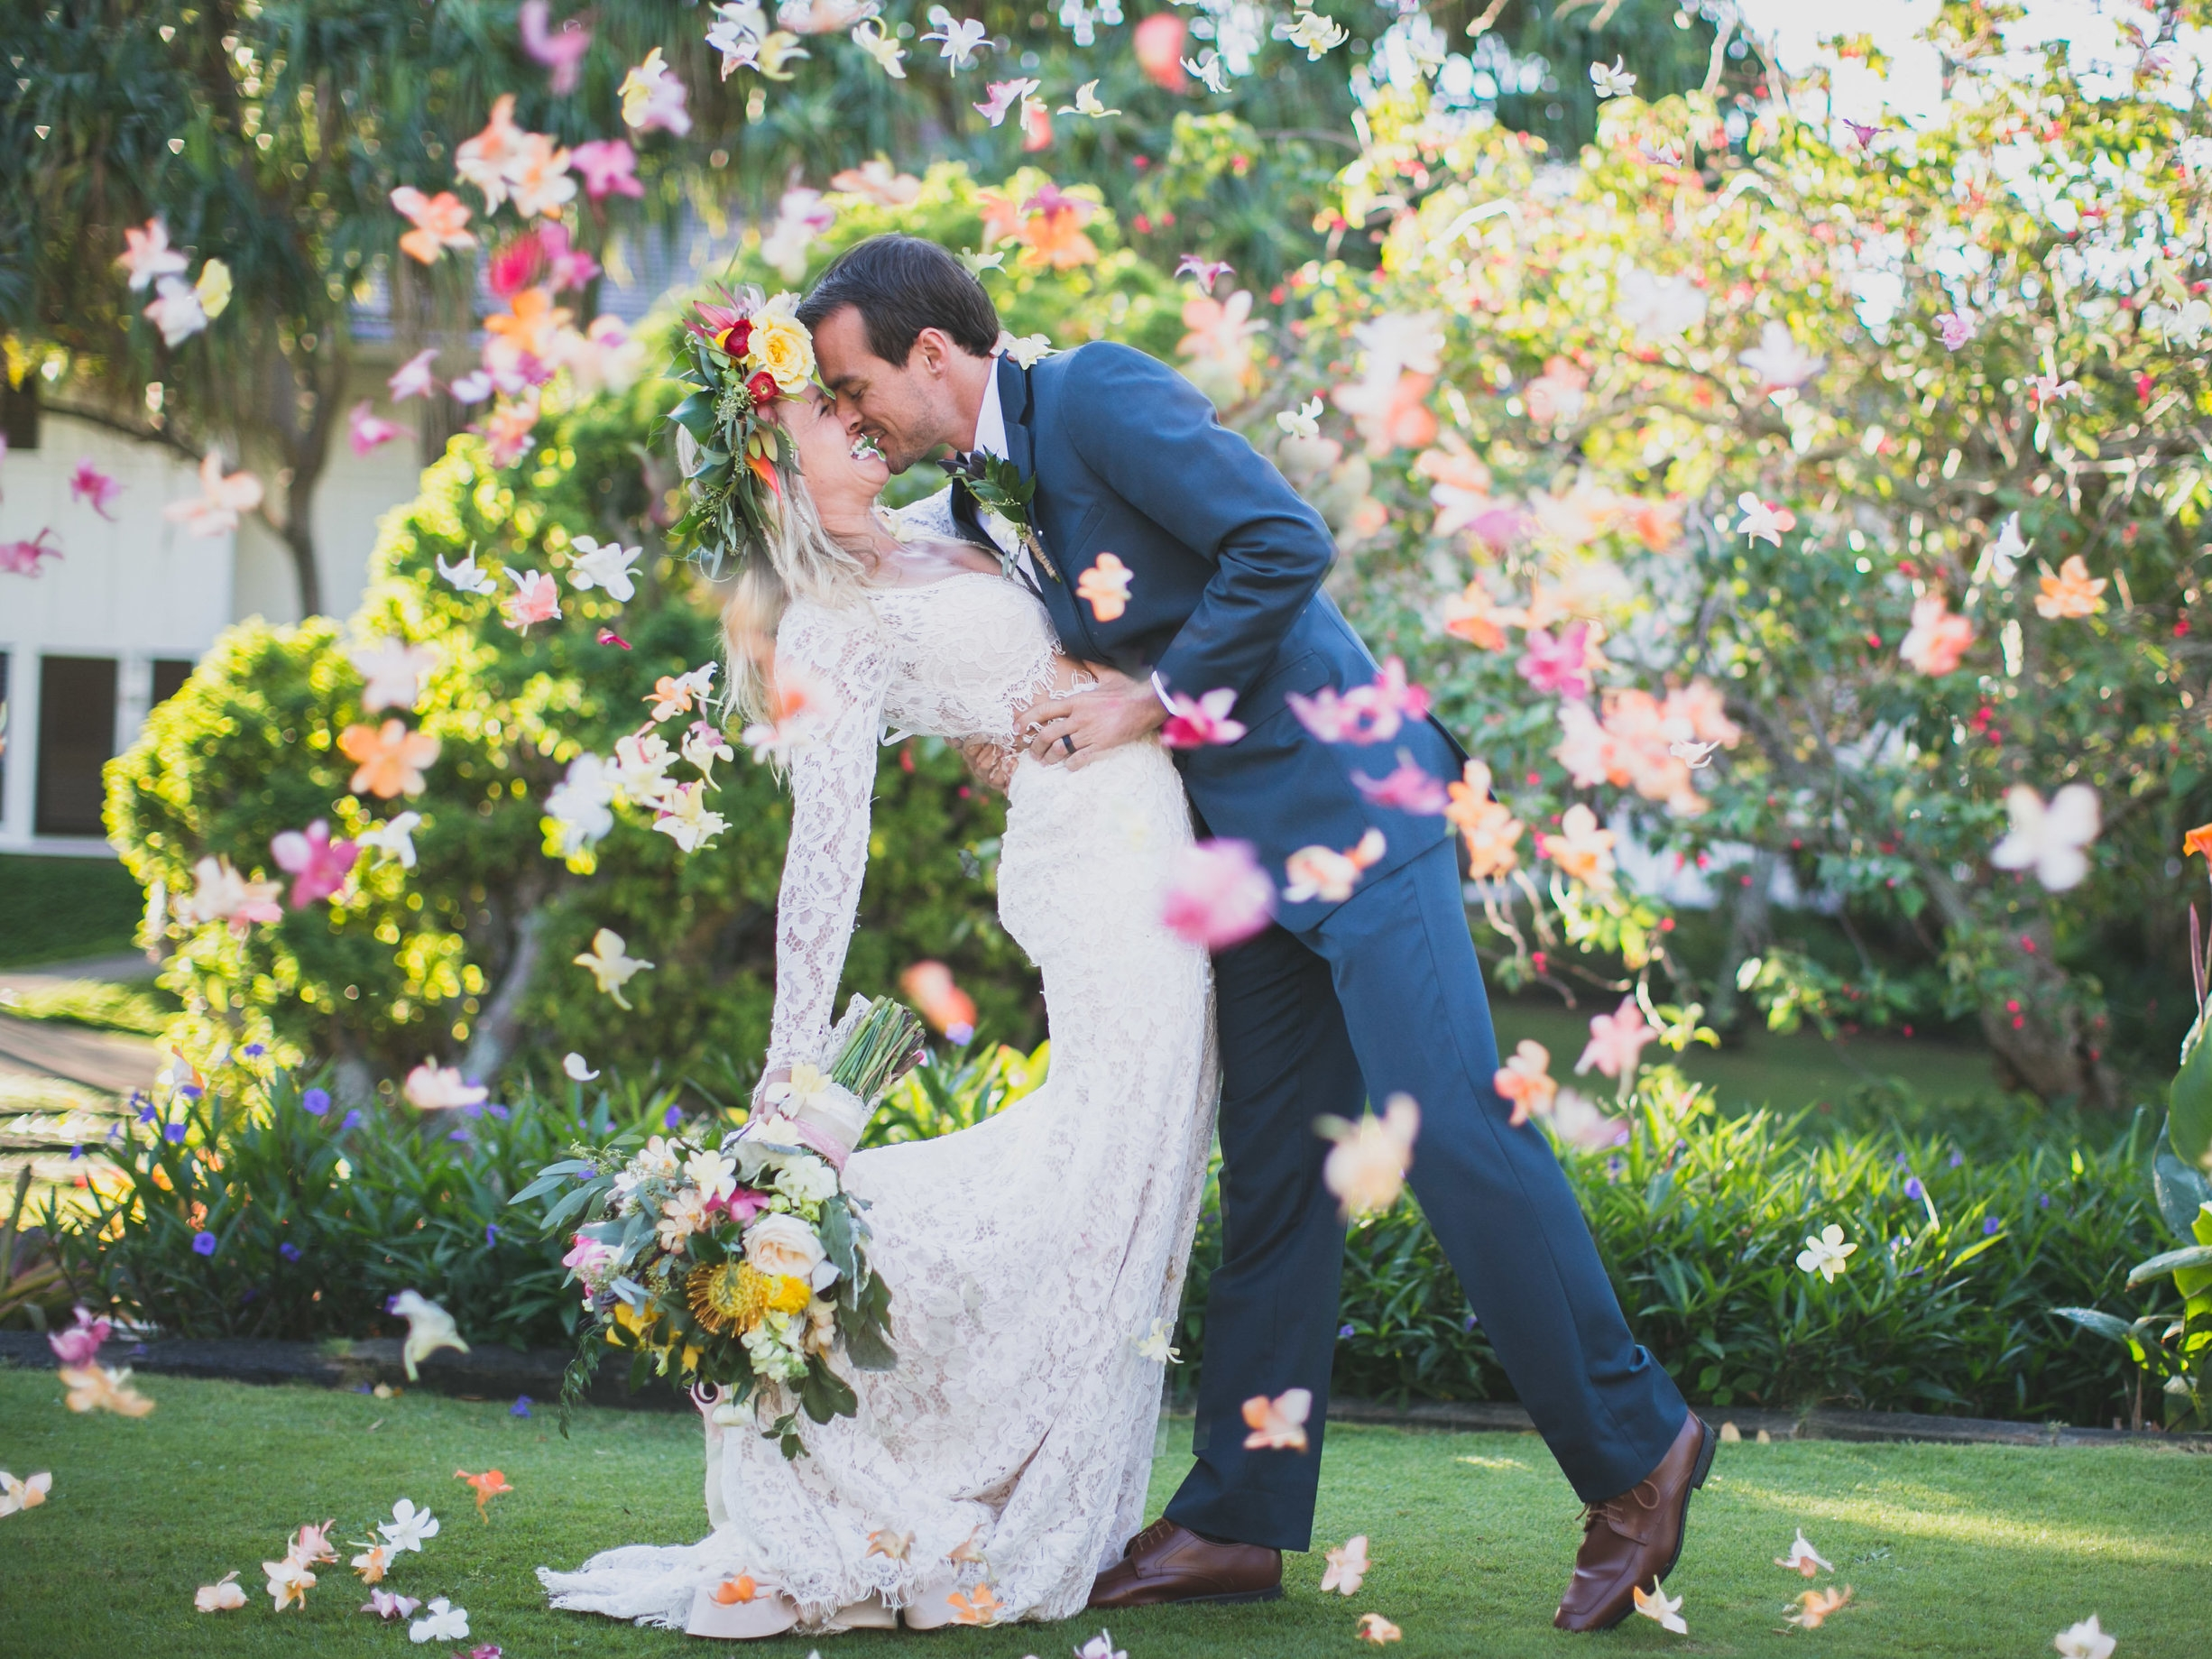 Aloha Bridal Connections